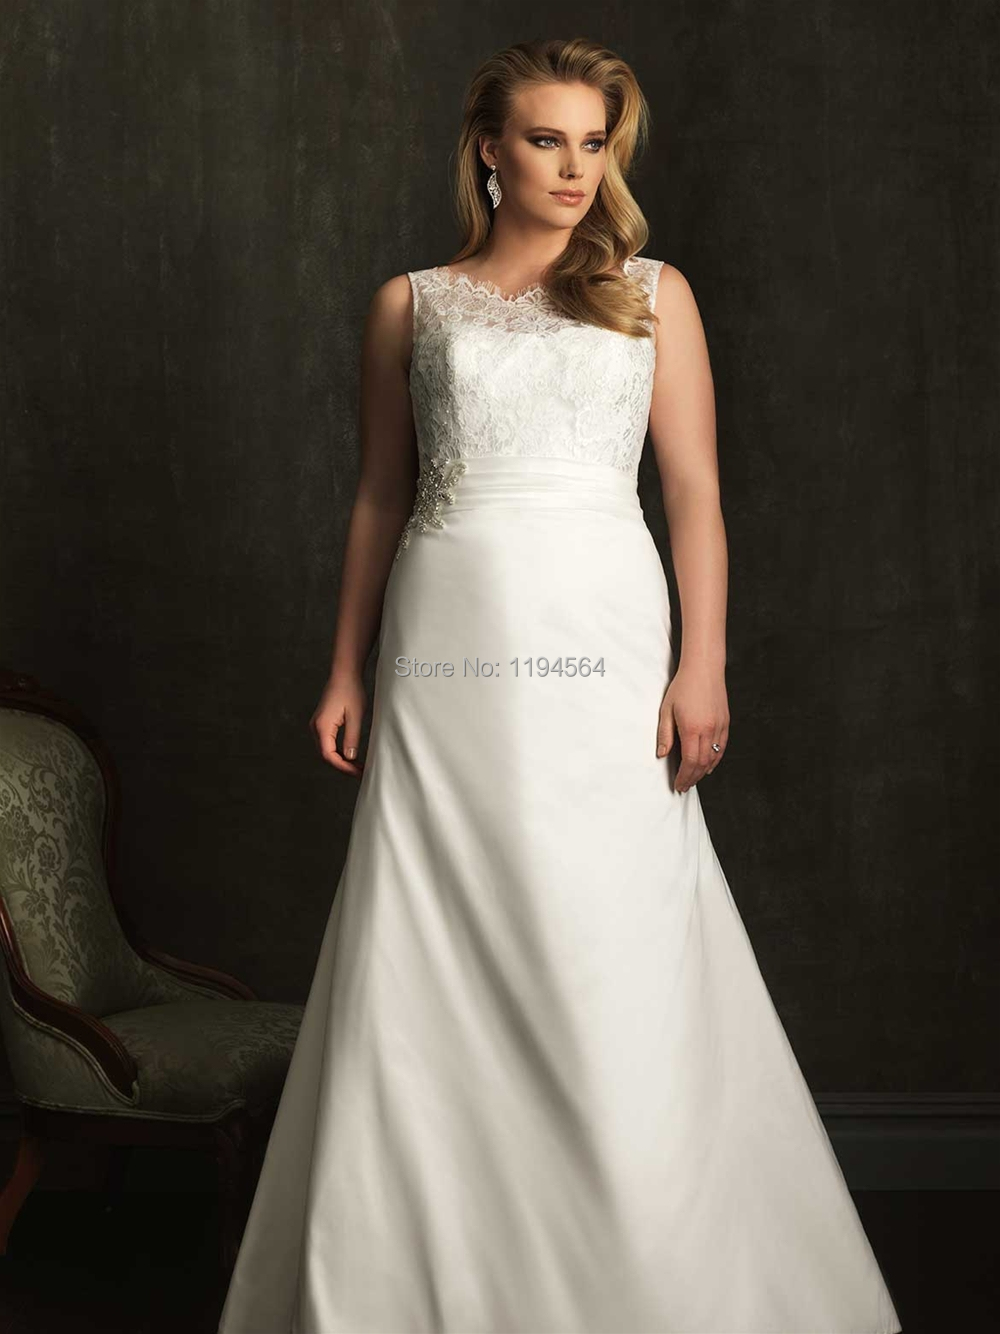 Online Get Cheap Plus Size Ivory Lace Wedding Dress A Line ...